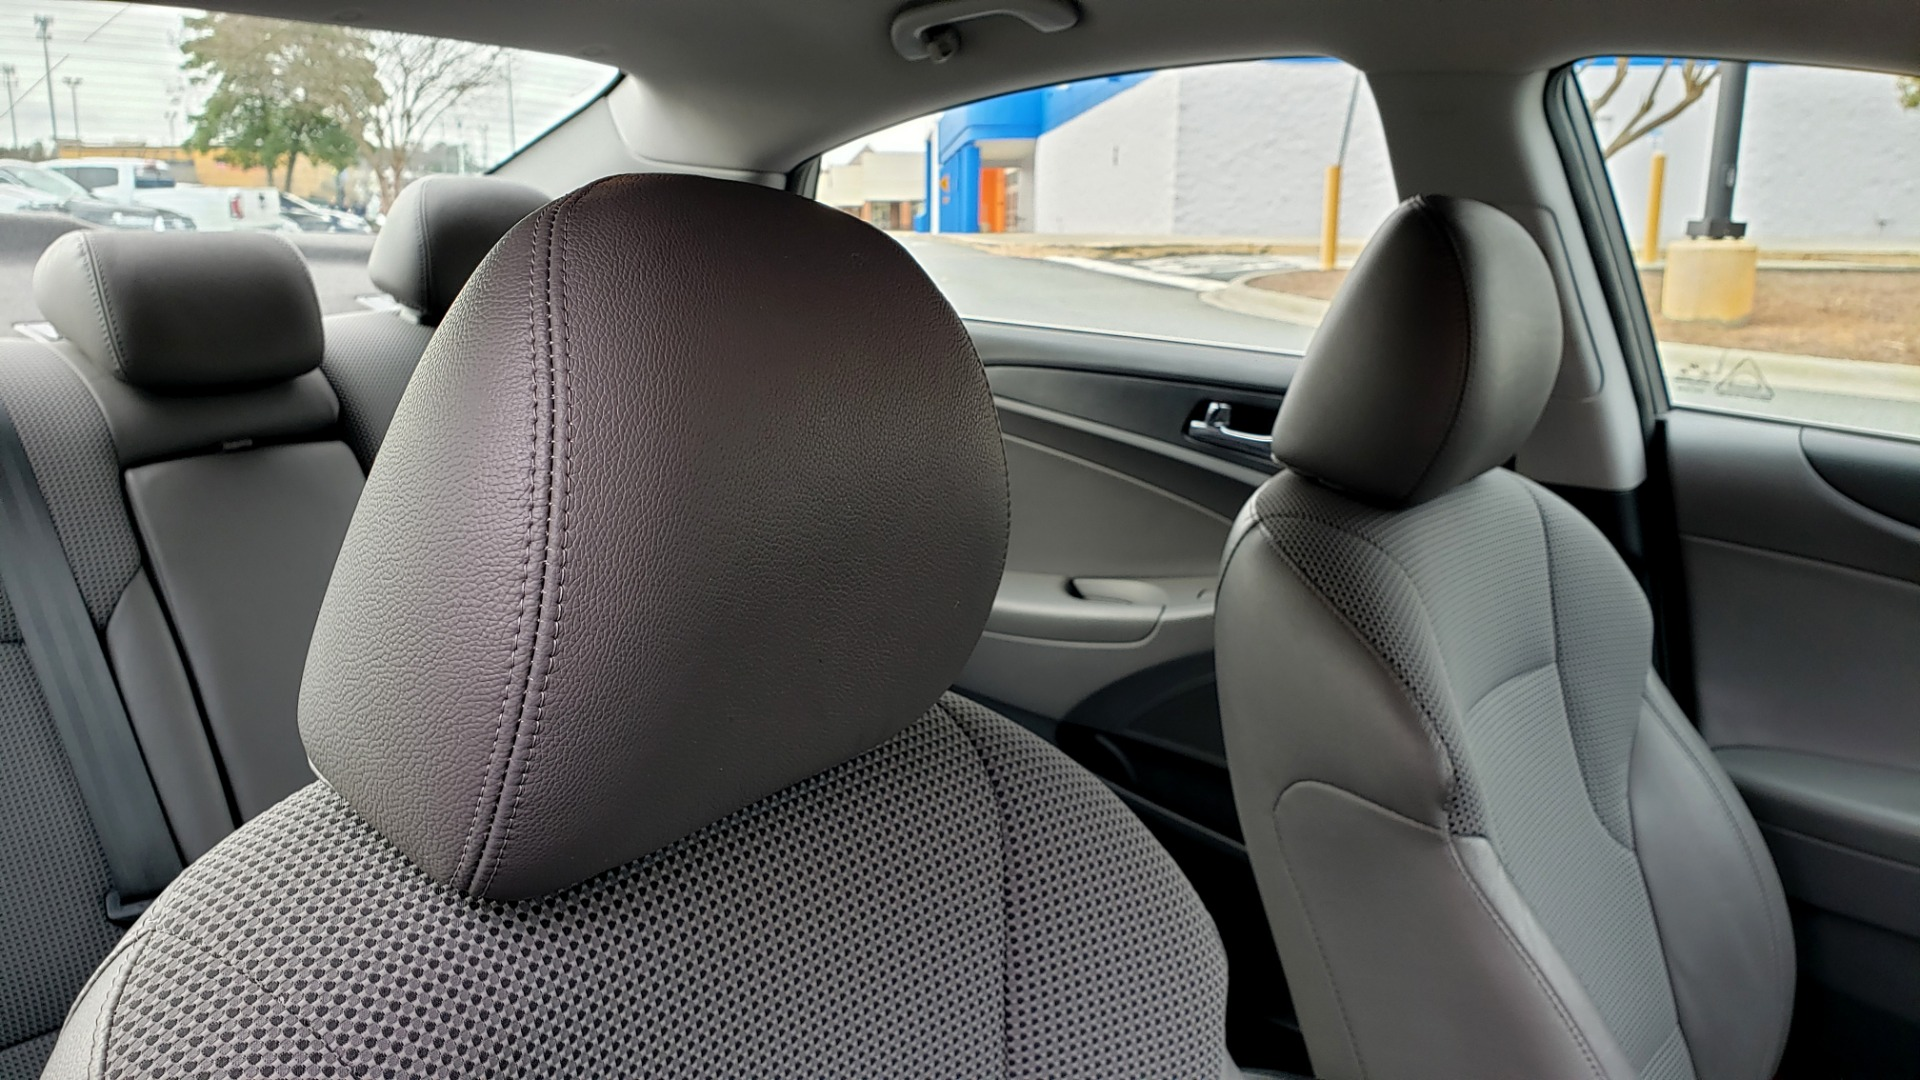 Used 2013 Hyundai SONATA SE AUTO / 2.4L 4-CYL / 6-SPD AUTO / VERY CLEAN for sale Sold at Formula Imports in Charlotte NC 28227 64